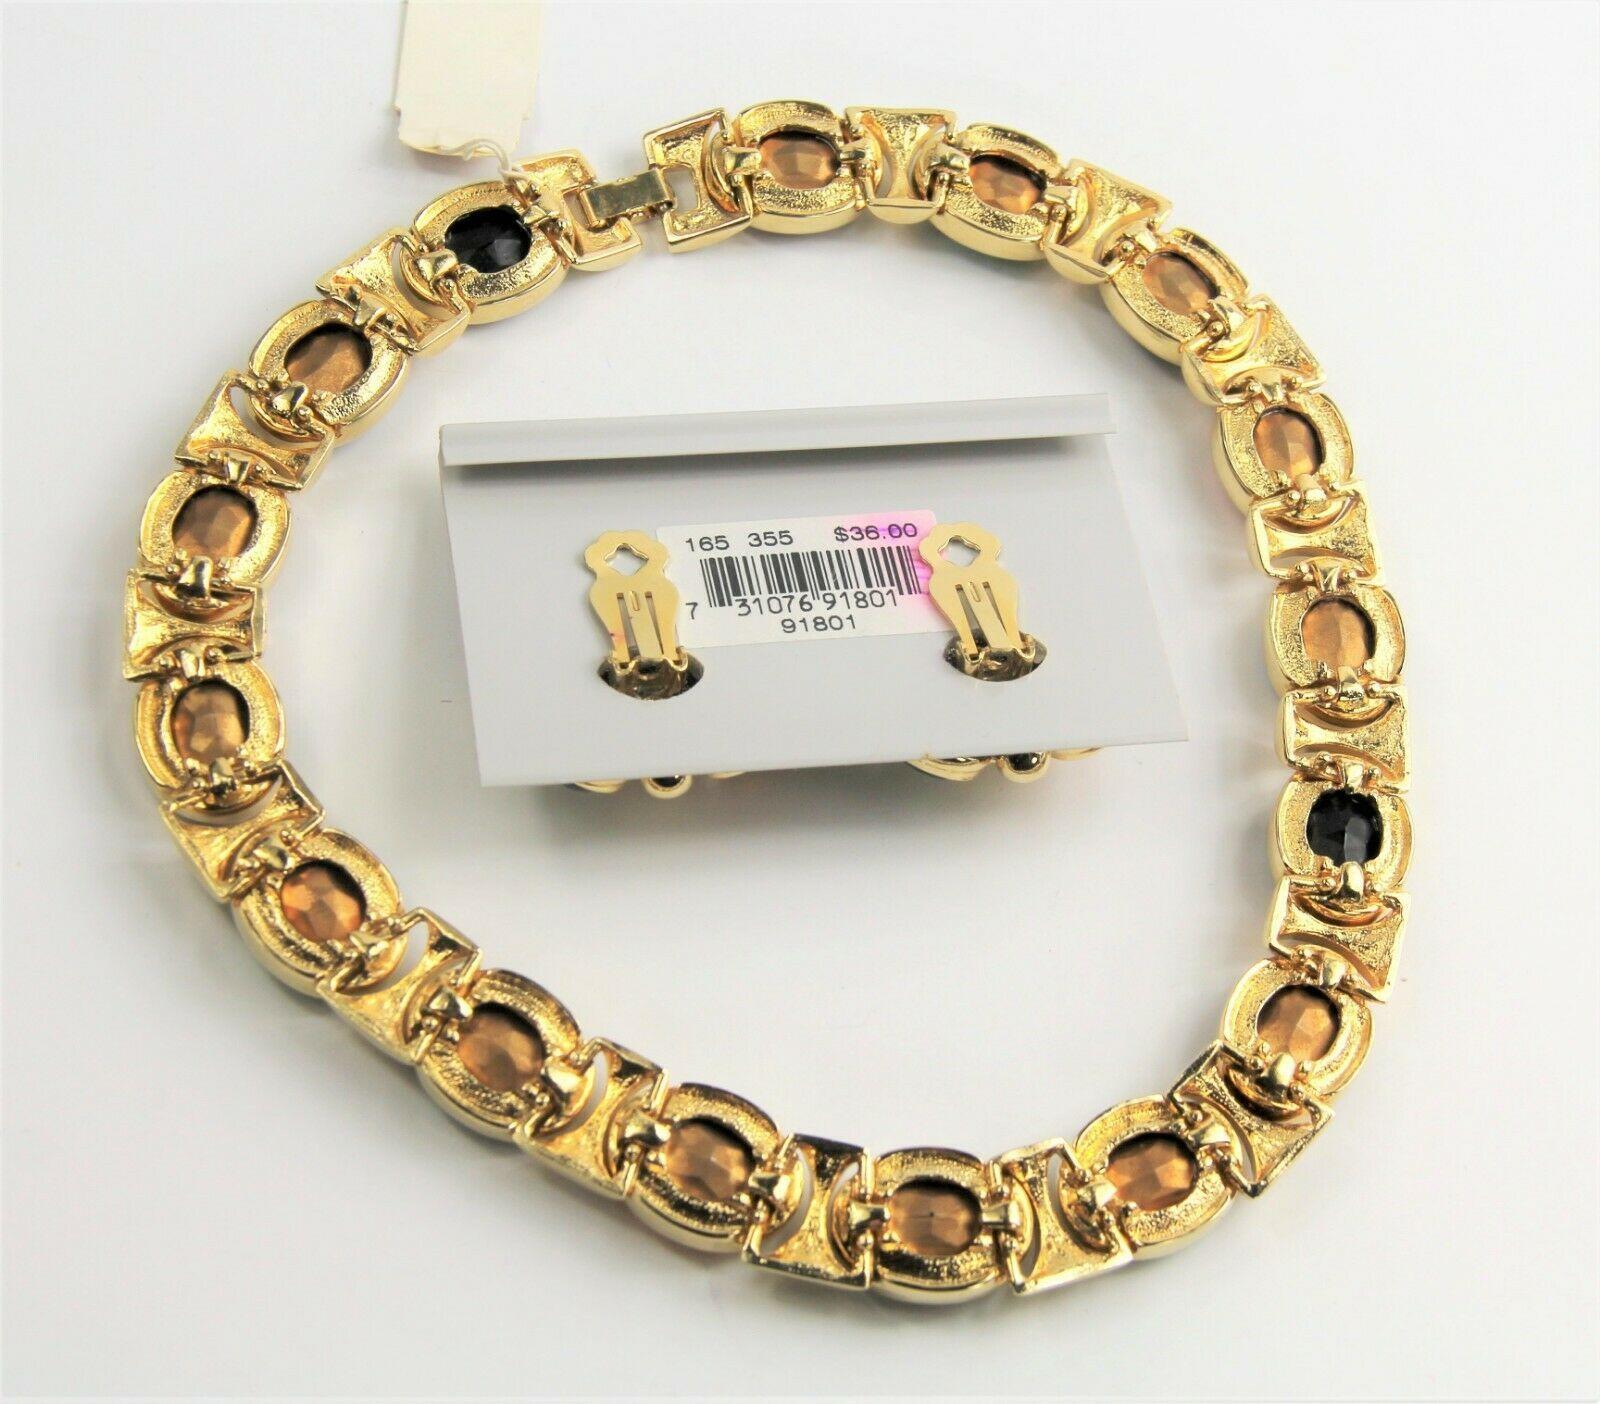 80s ESTATE VINTAGE Jewelry HIGH END NOS BIG GEM STATEMENT NECKLACE EARRINGS SET